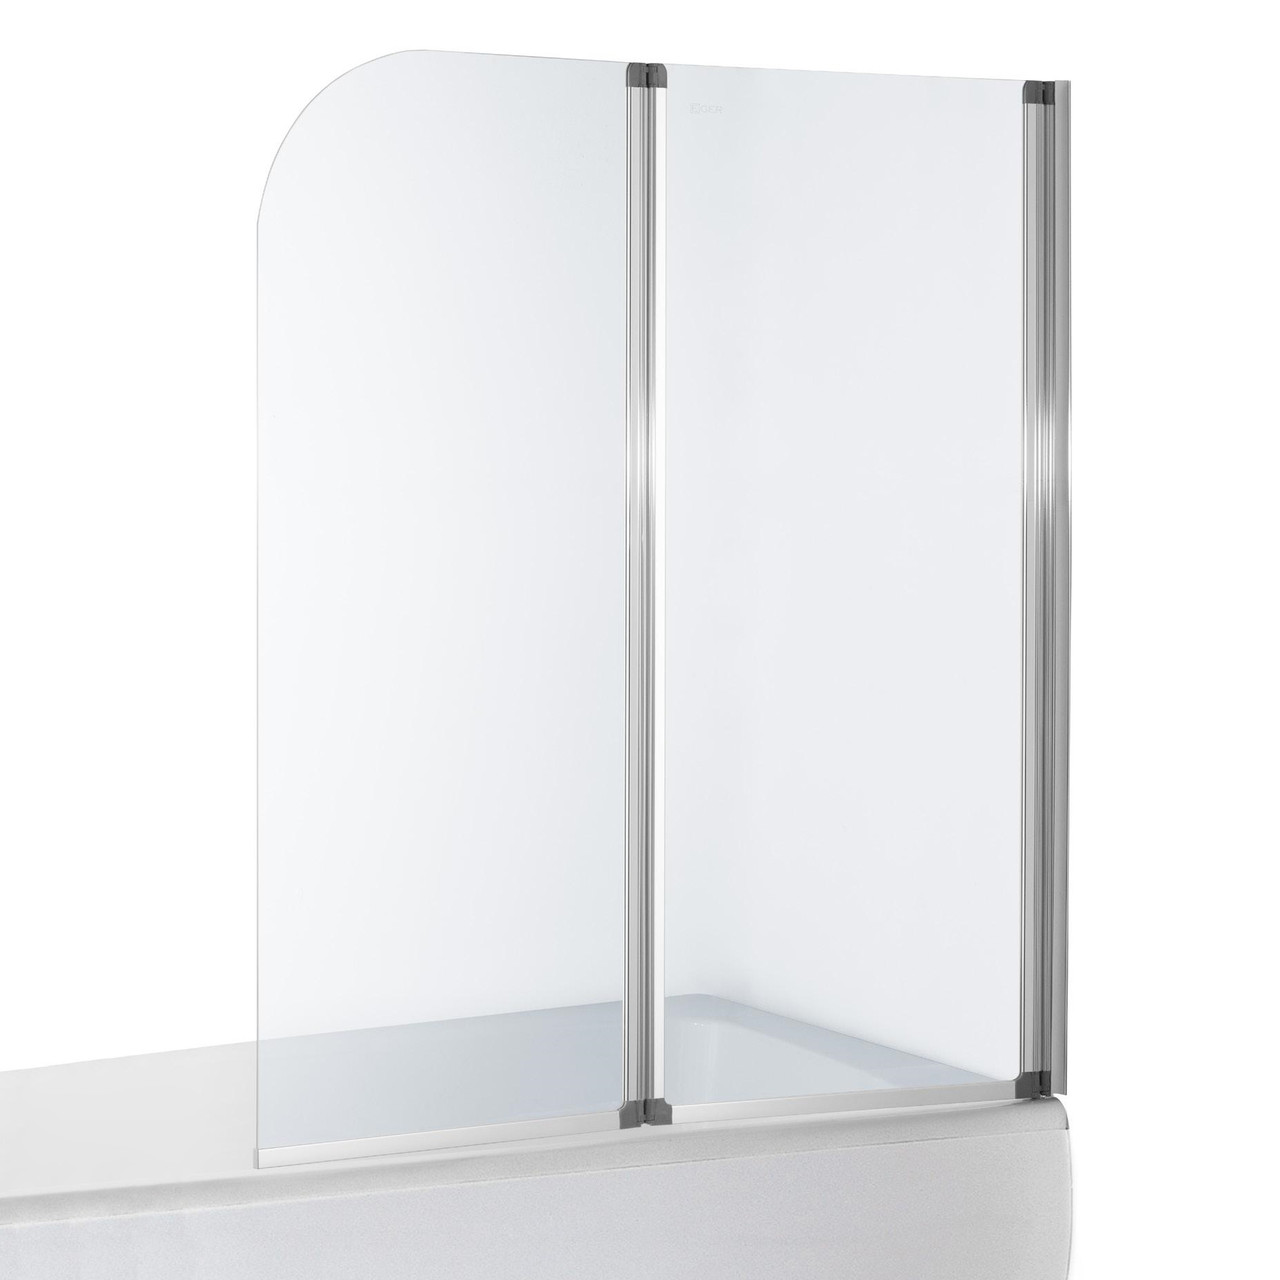 Eger Шторка на ванну 120 см, профиль хром, 599-121CH